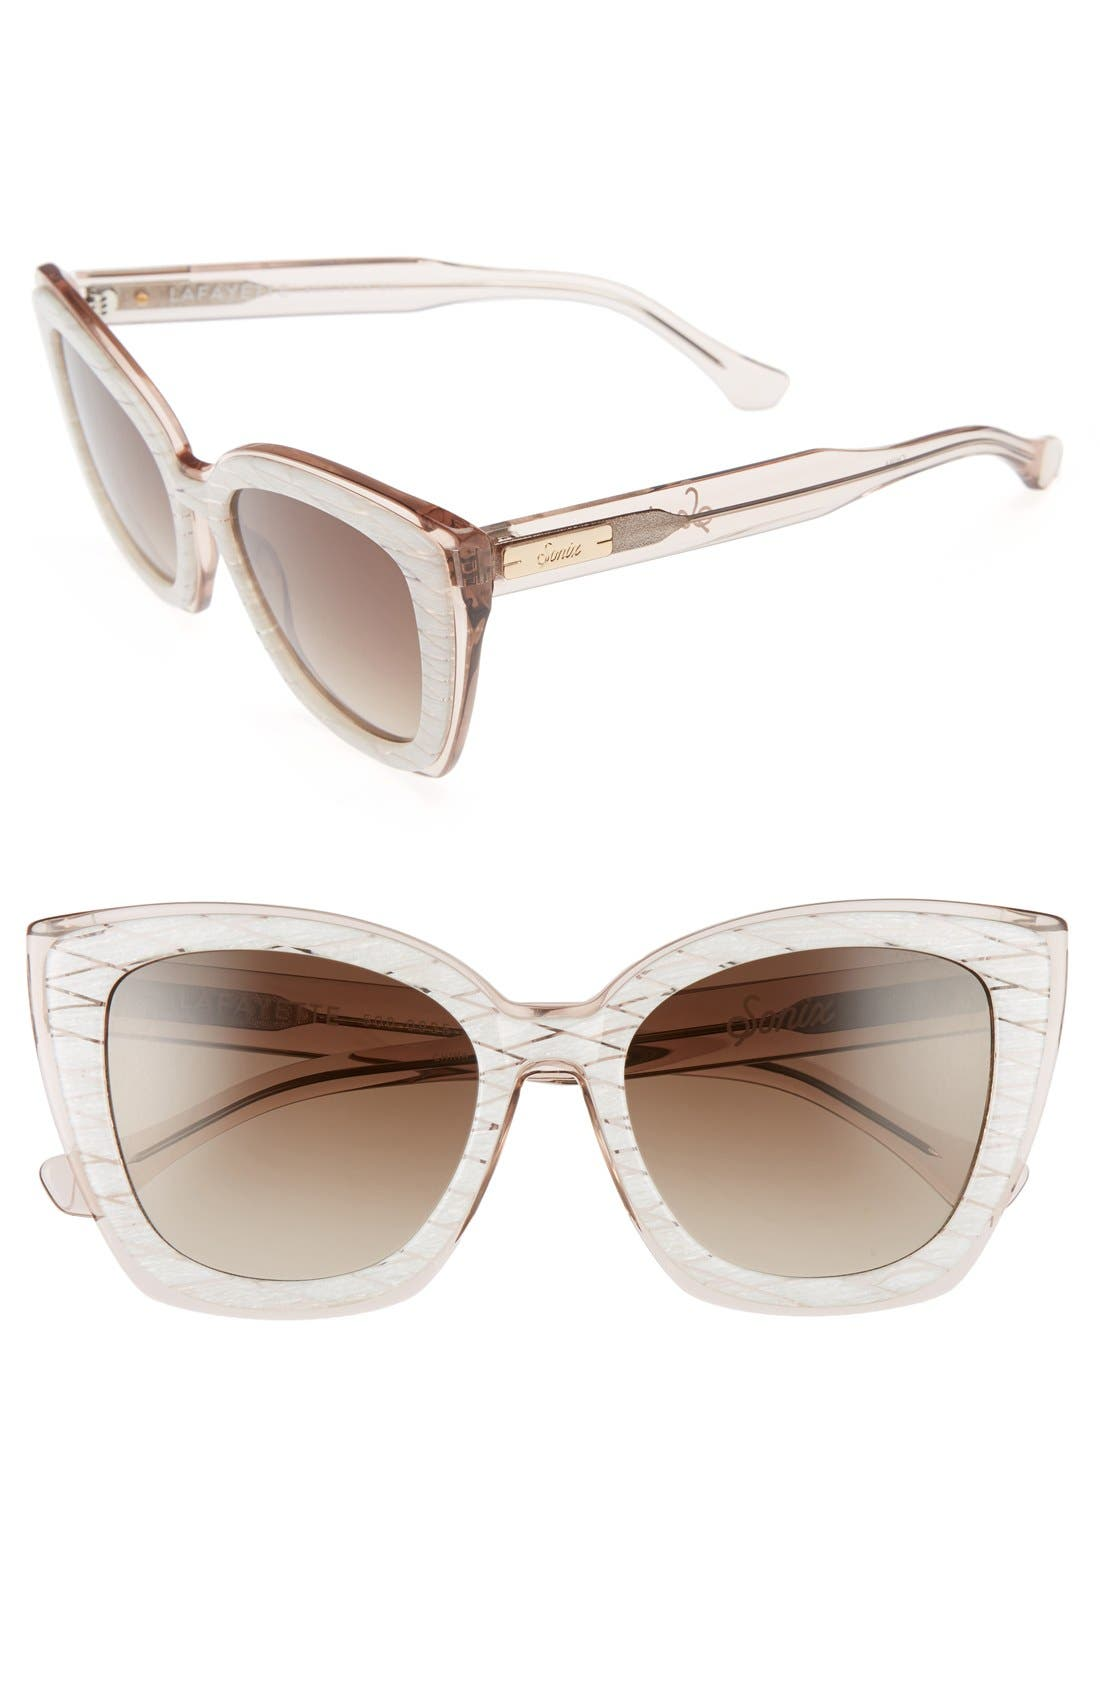 Main Image - Sonix Lafayette 53mm Gradient Cat Eye Sunglasses